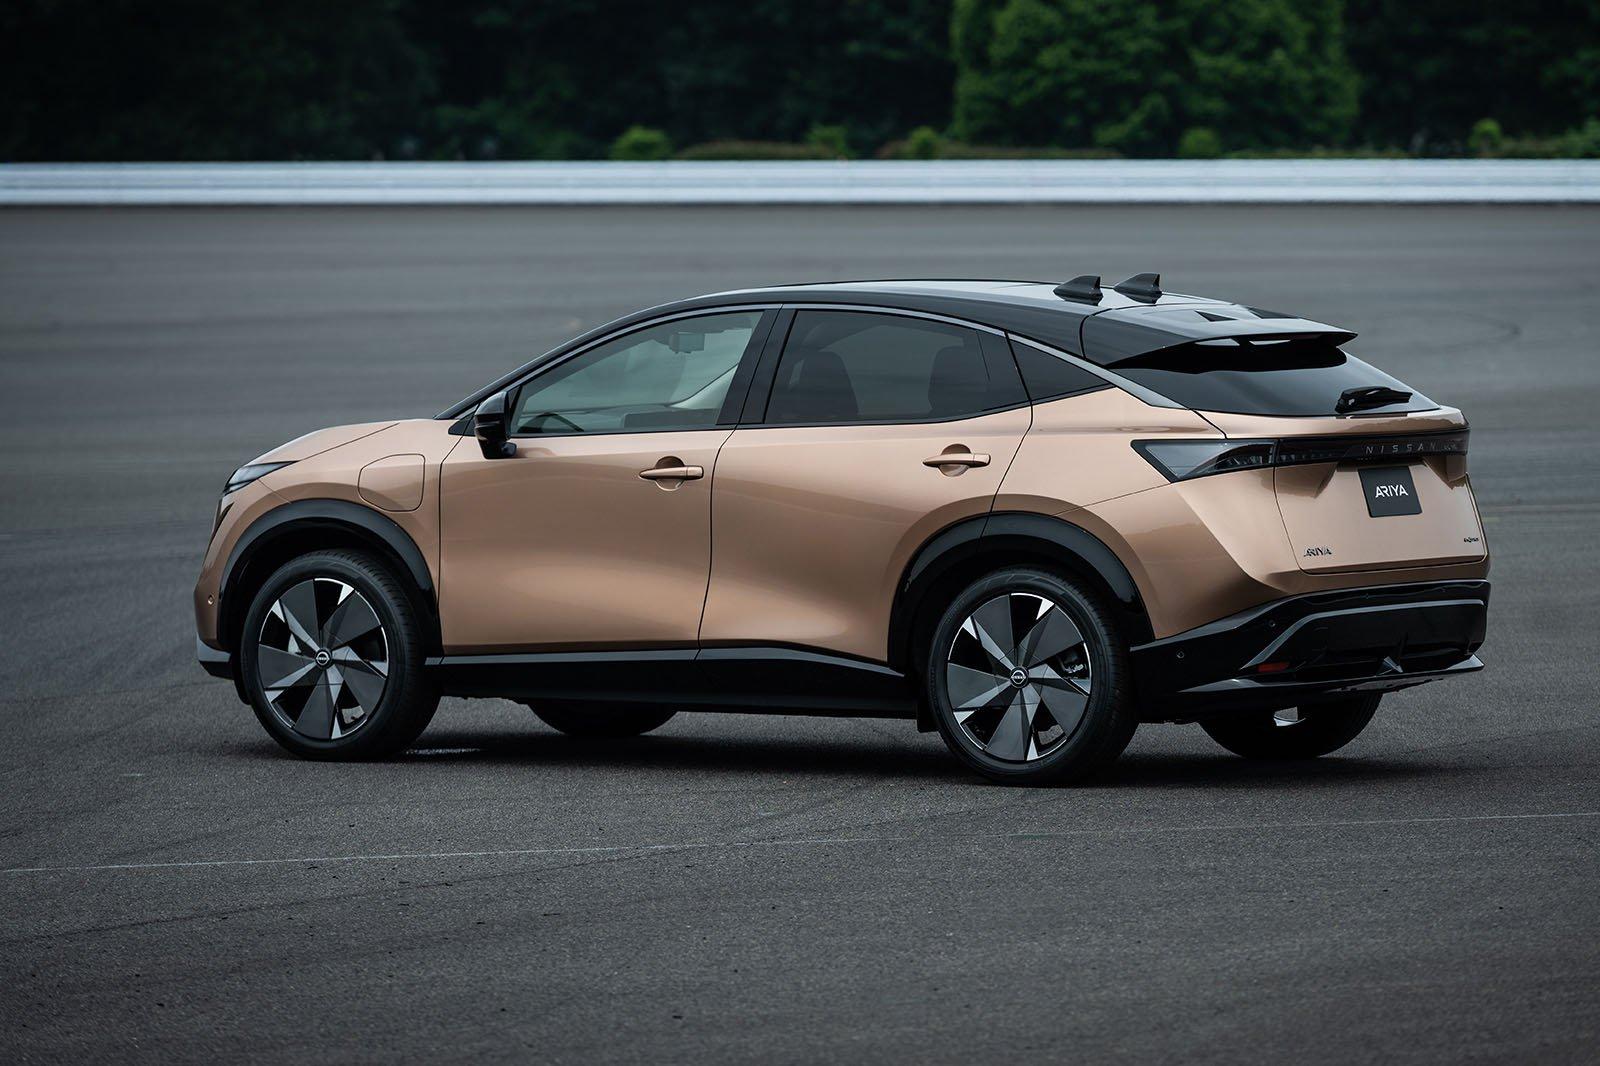 2021 Nissan Ariya rear